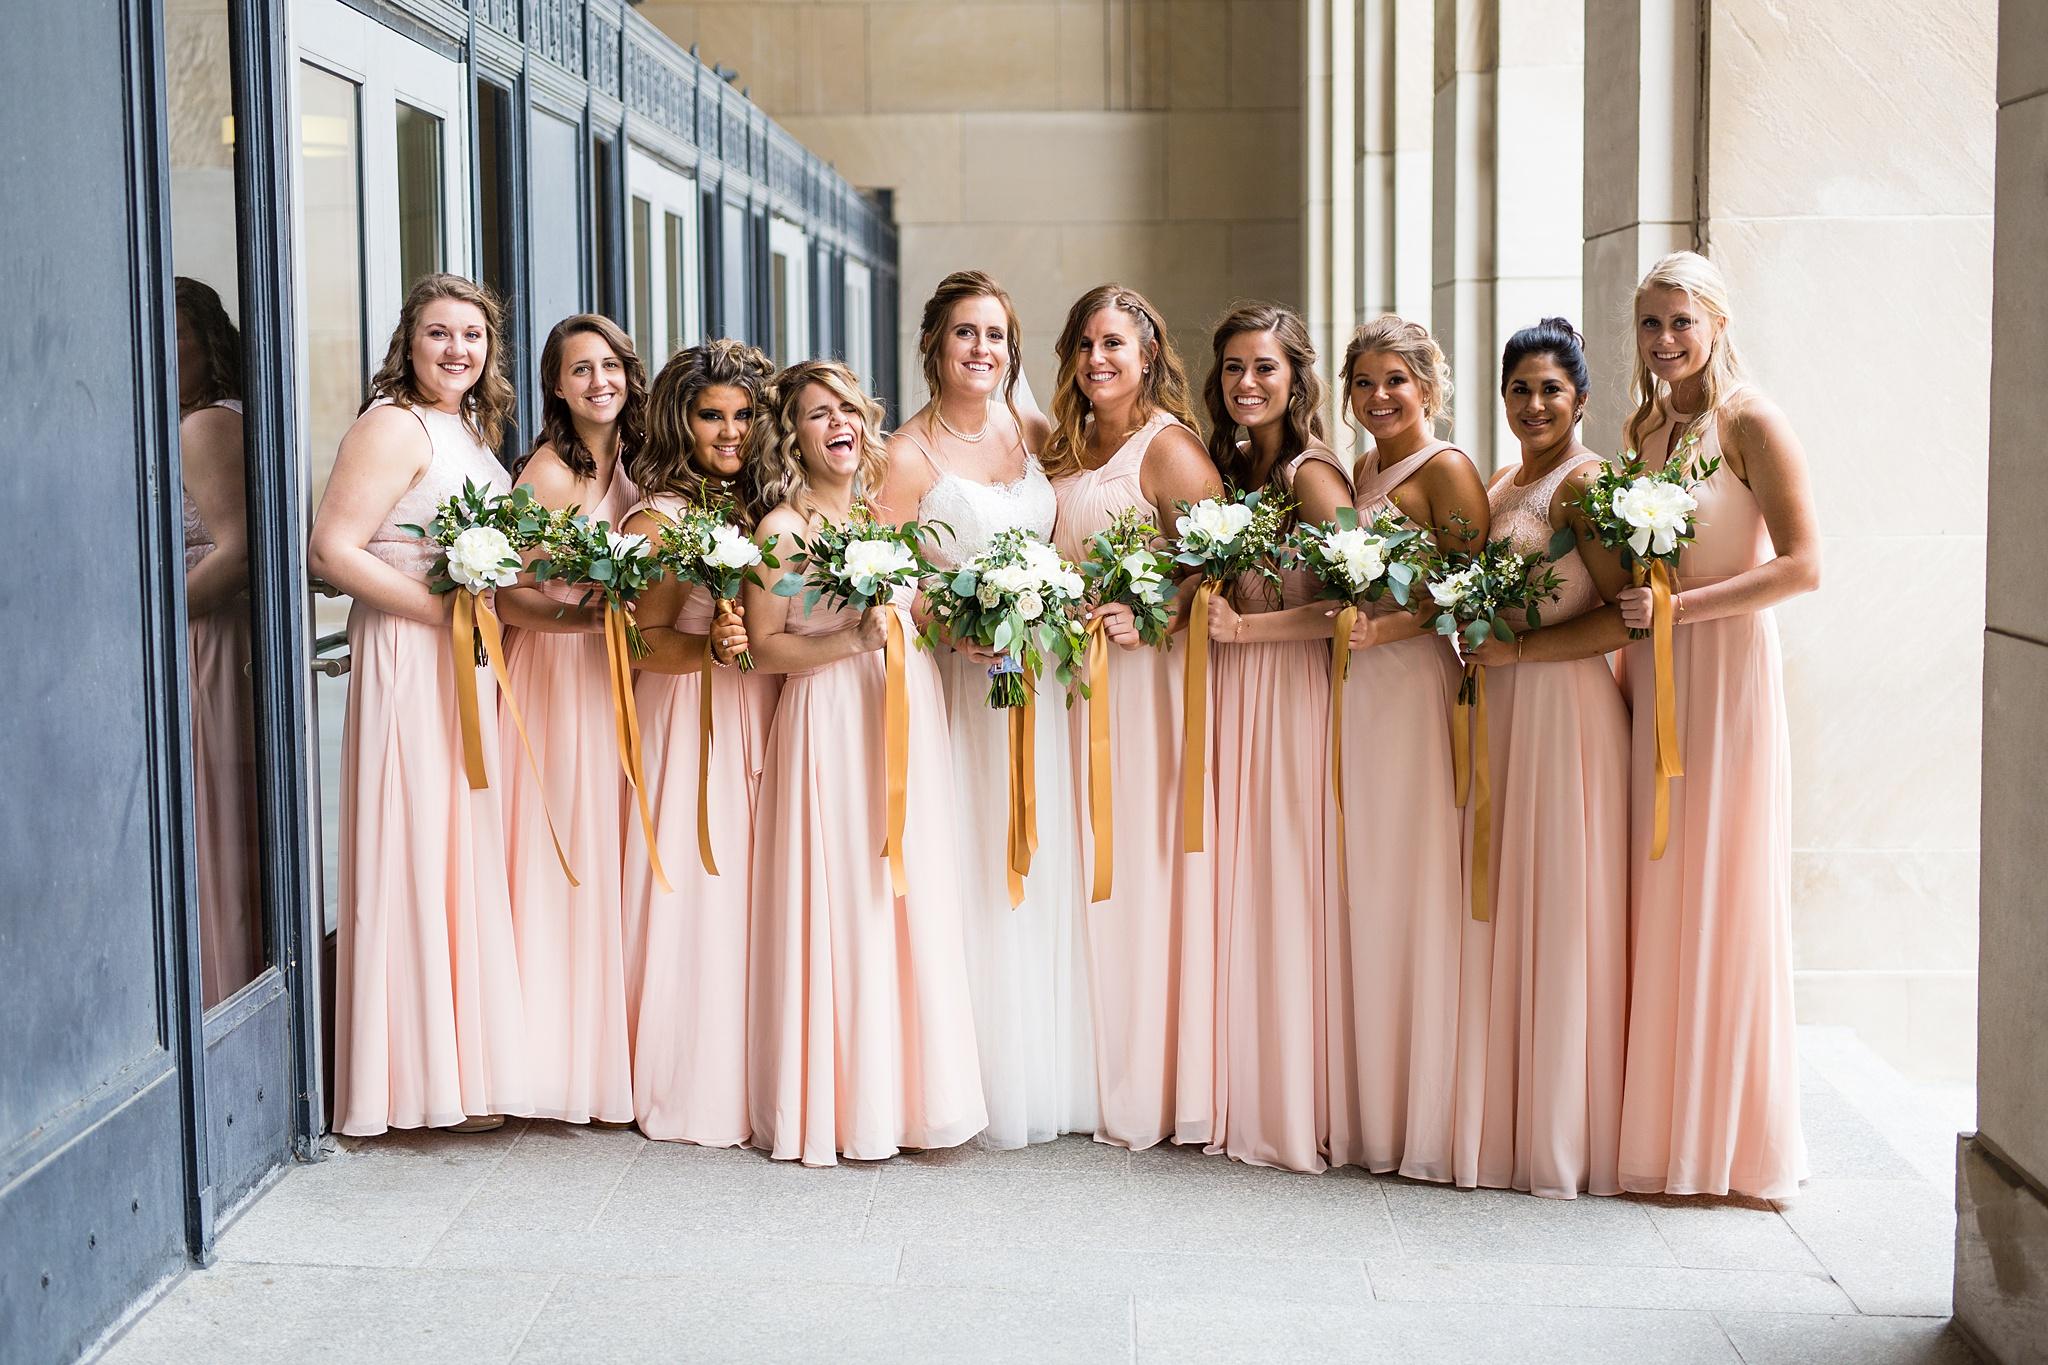 Meghan_Drew_Grand_Rapids_Cheney_place_Wedding039.JPG